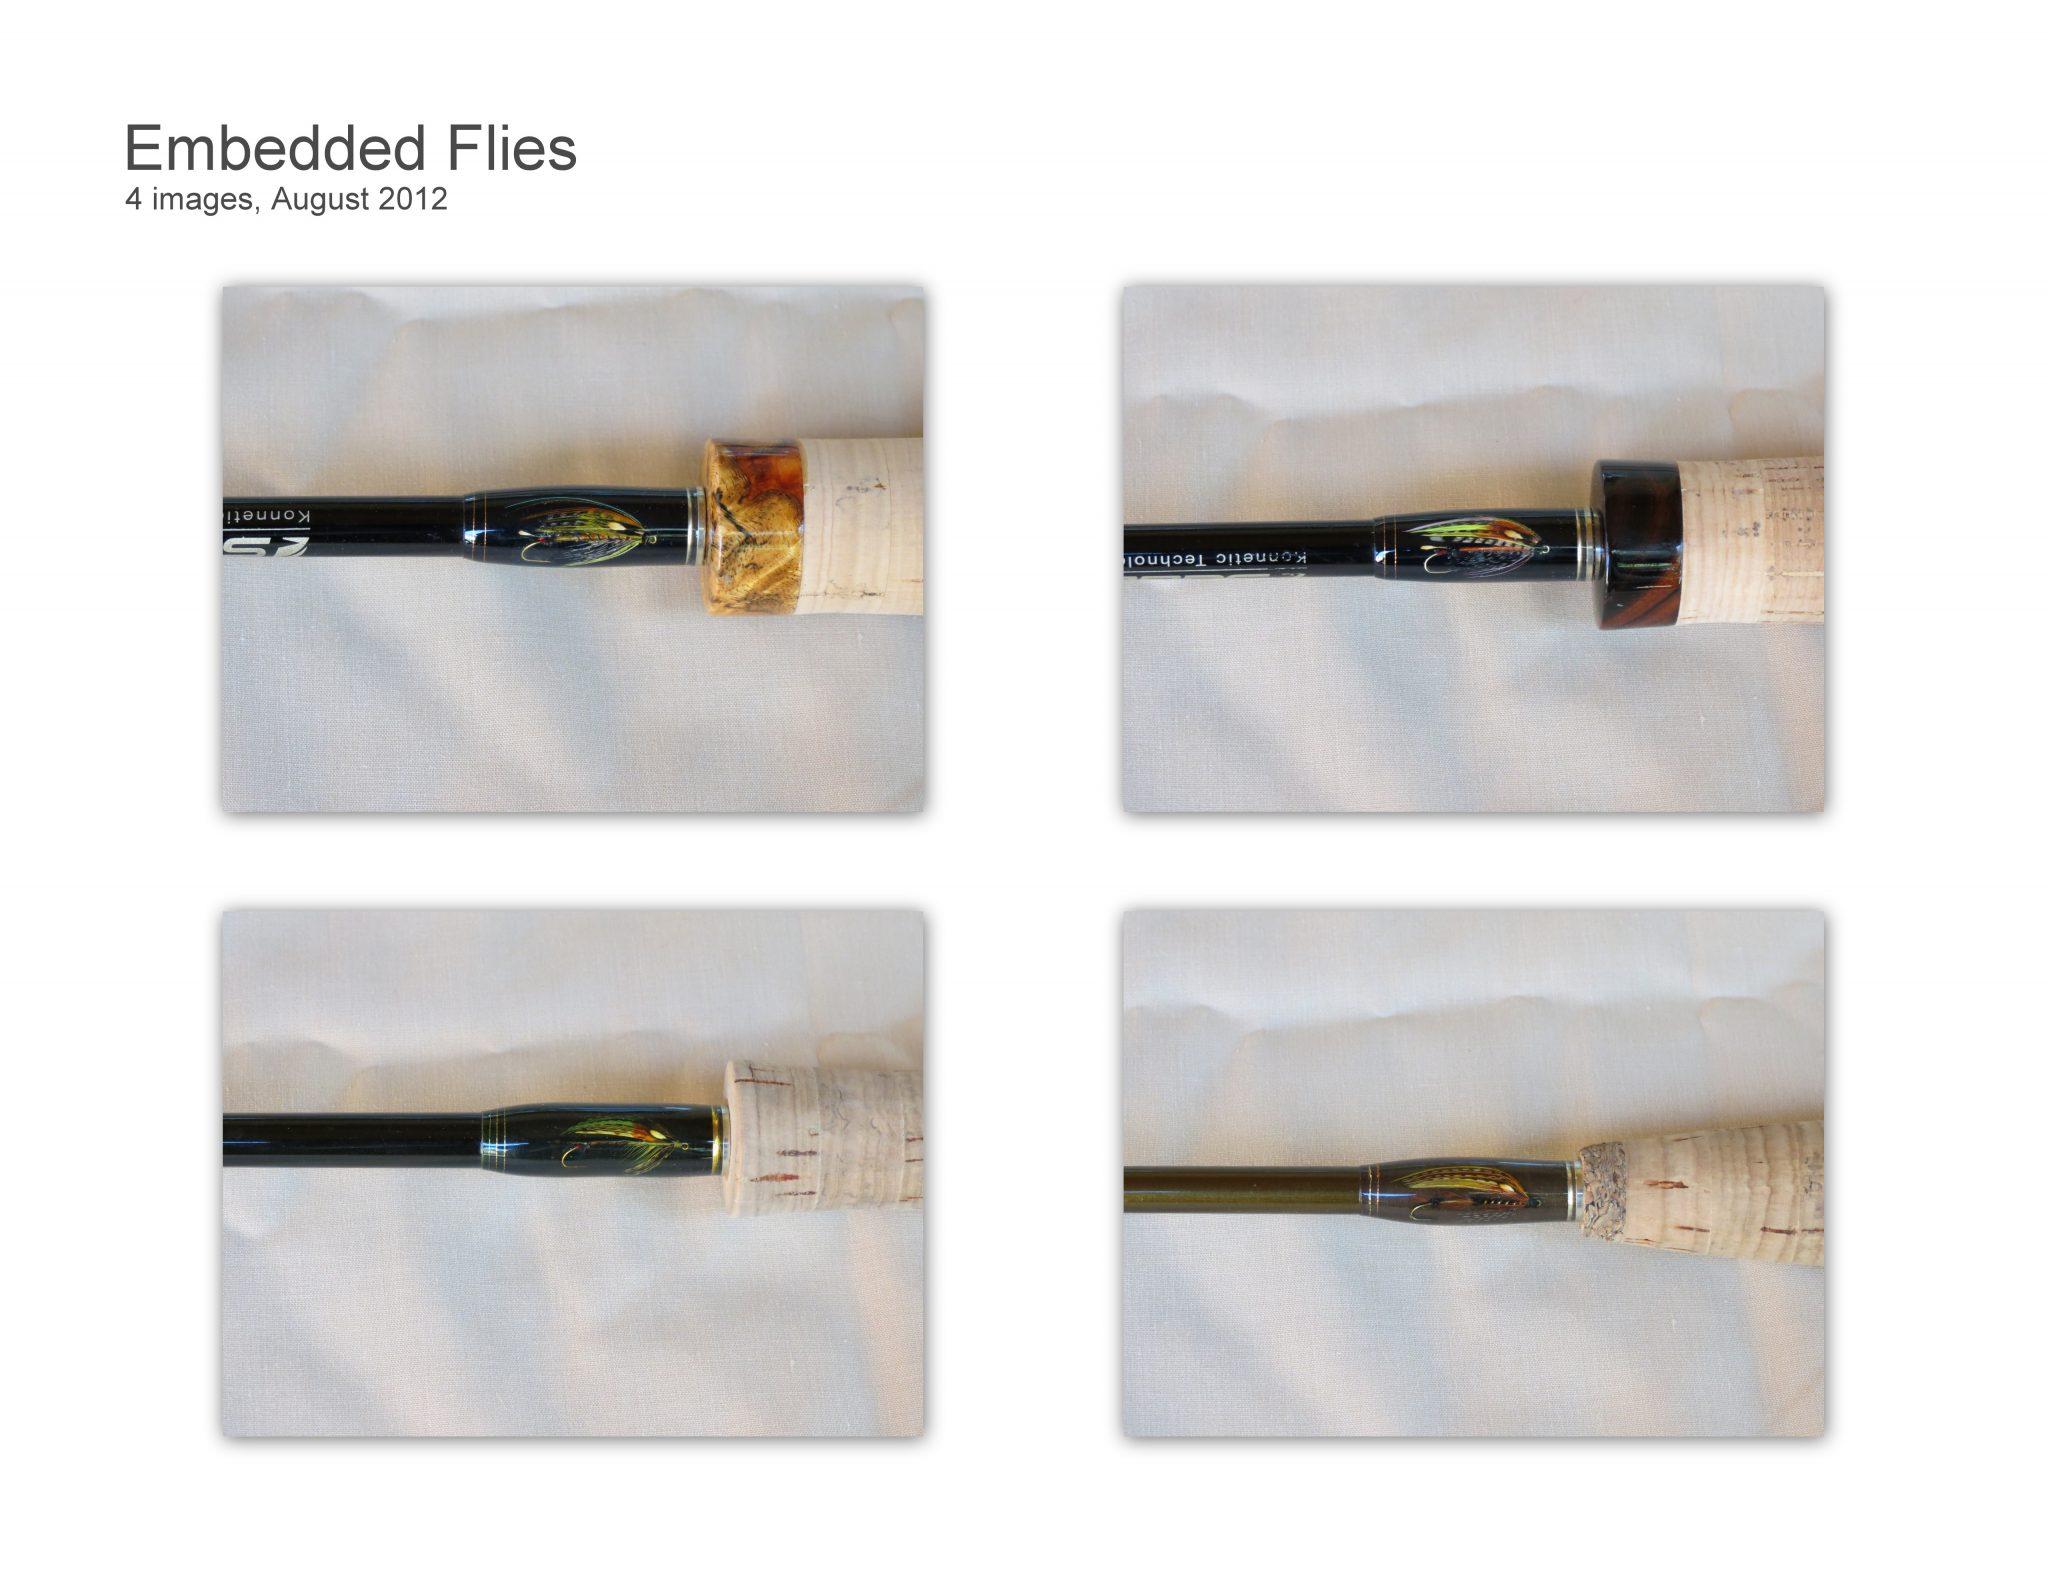 Embedded Flies1